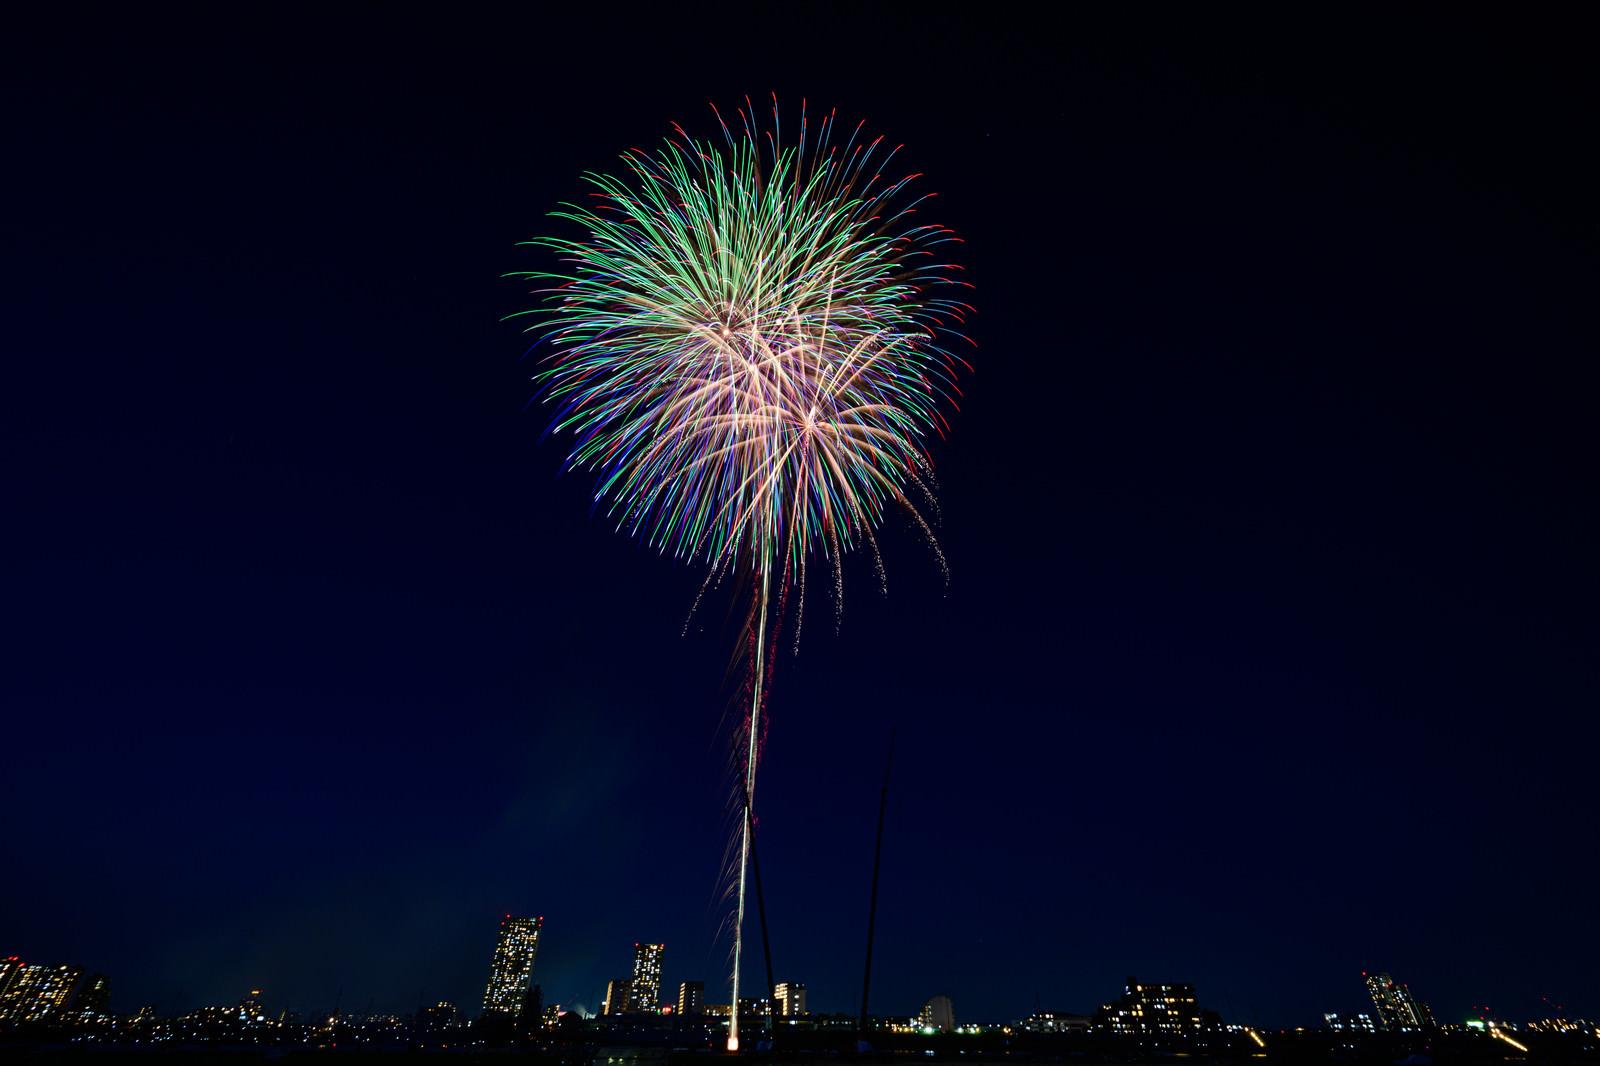 「夜空を彩る花火大会(江戸川区花火大会)」の写真